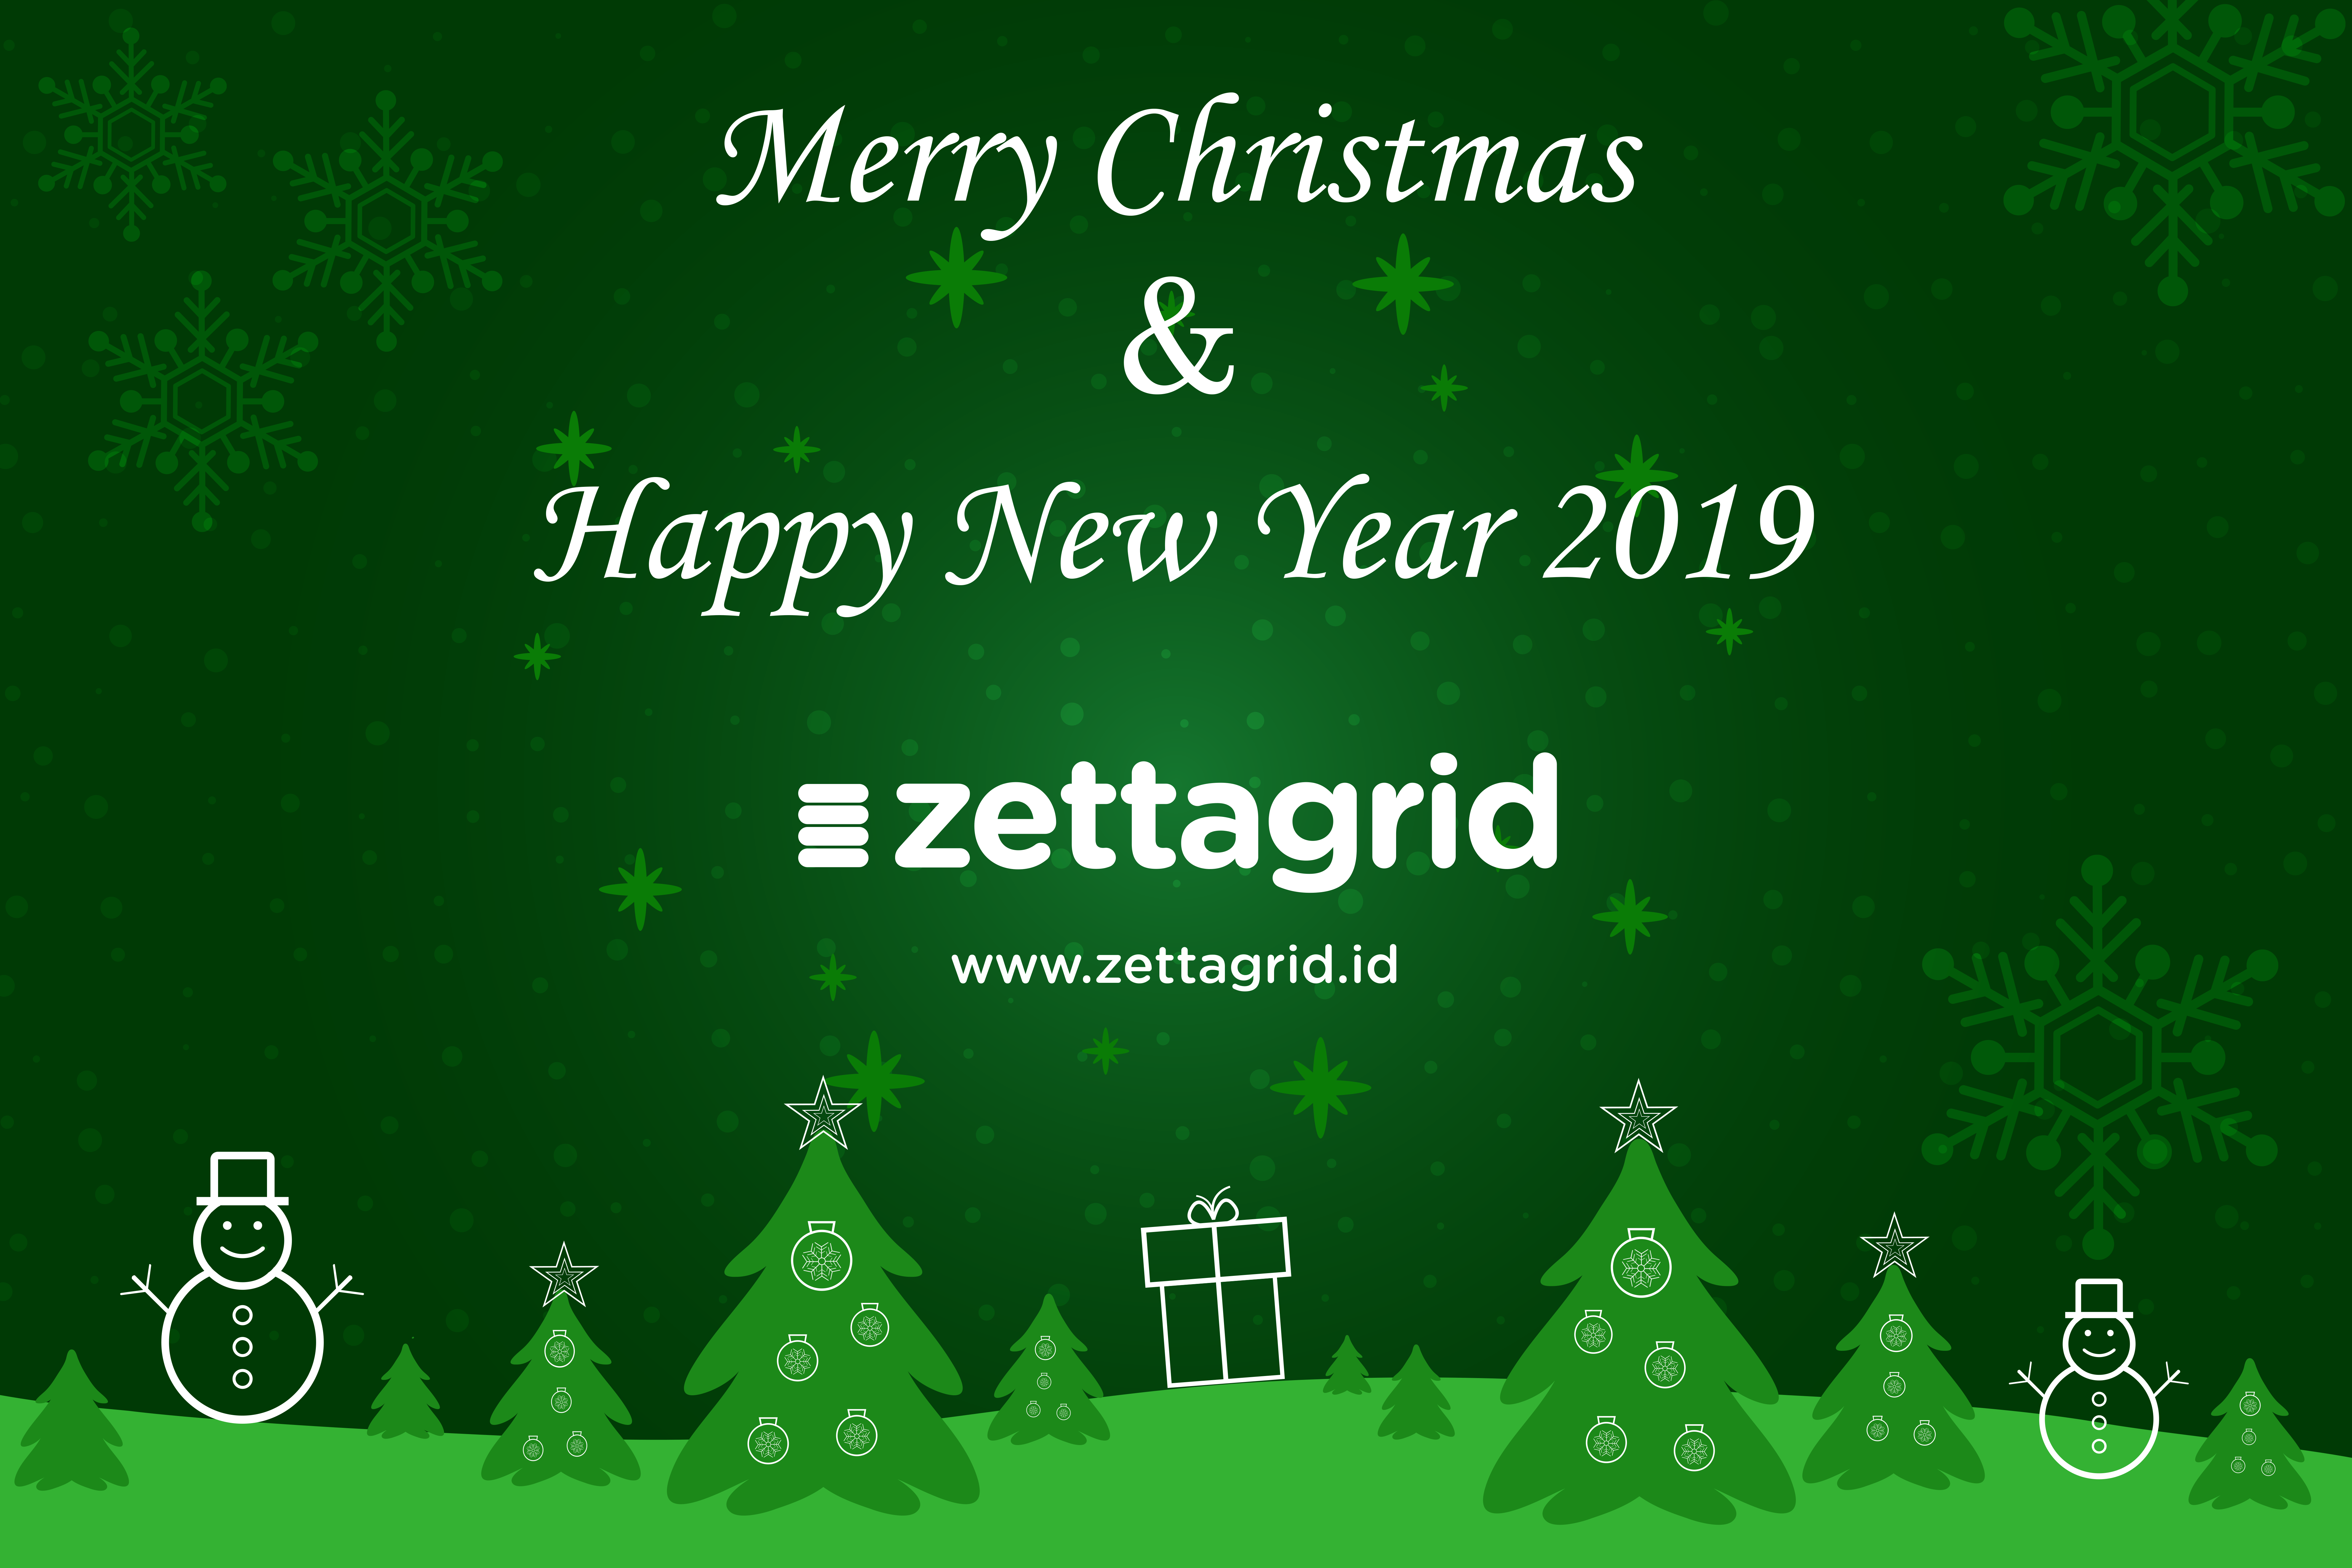 seasons greeting zettagrid